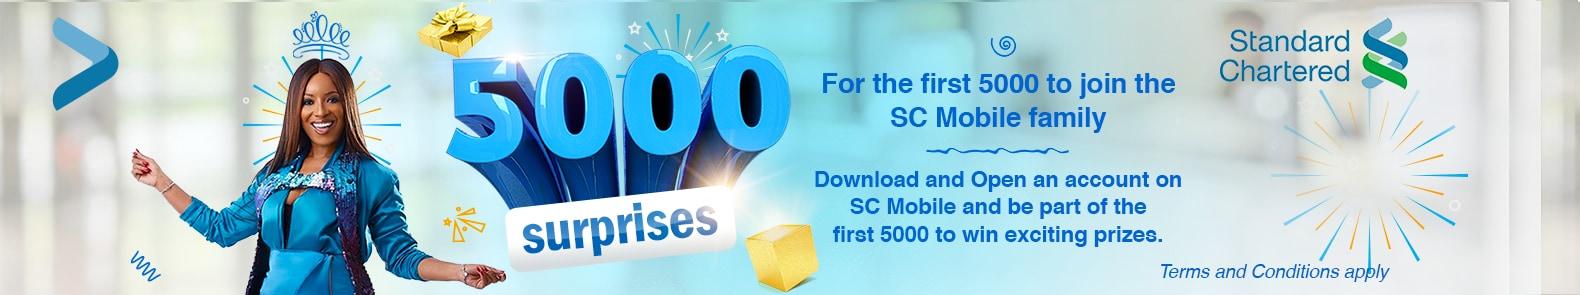 5000 surprises